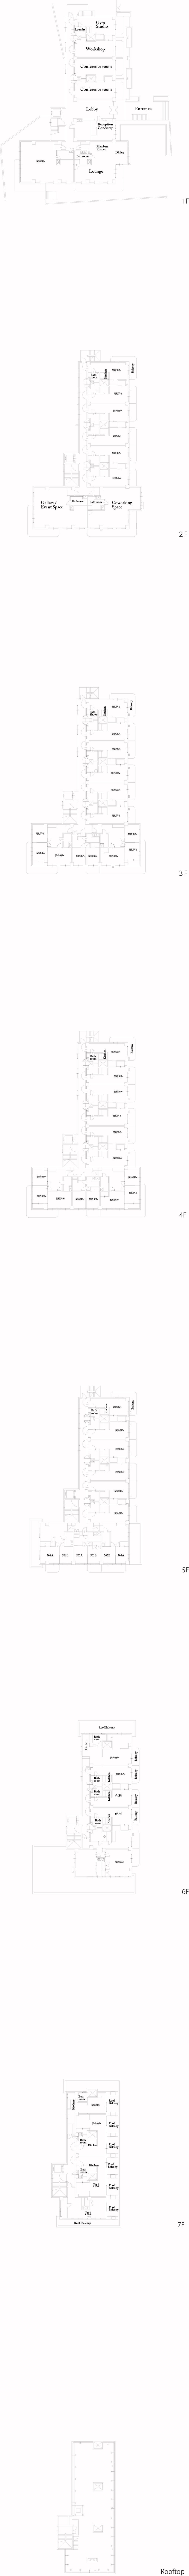 Floors 1-7.jpg